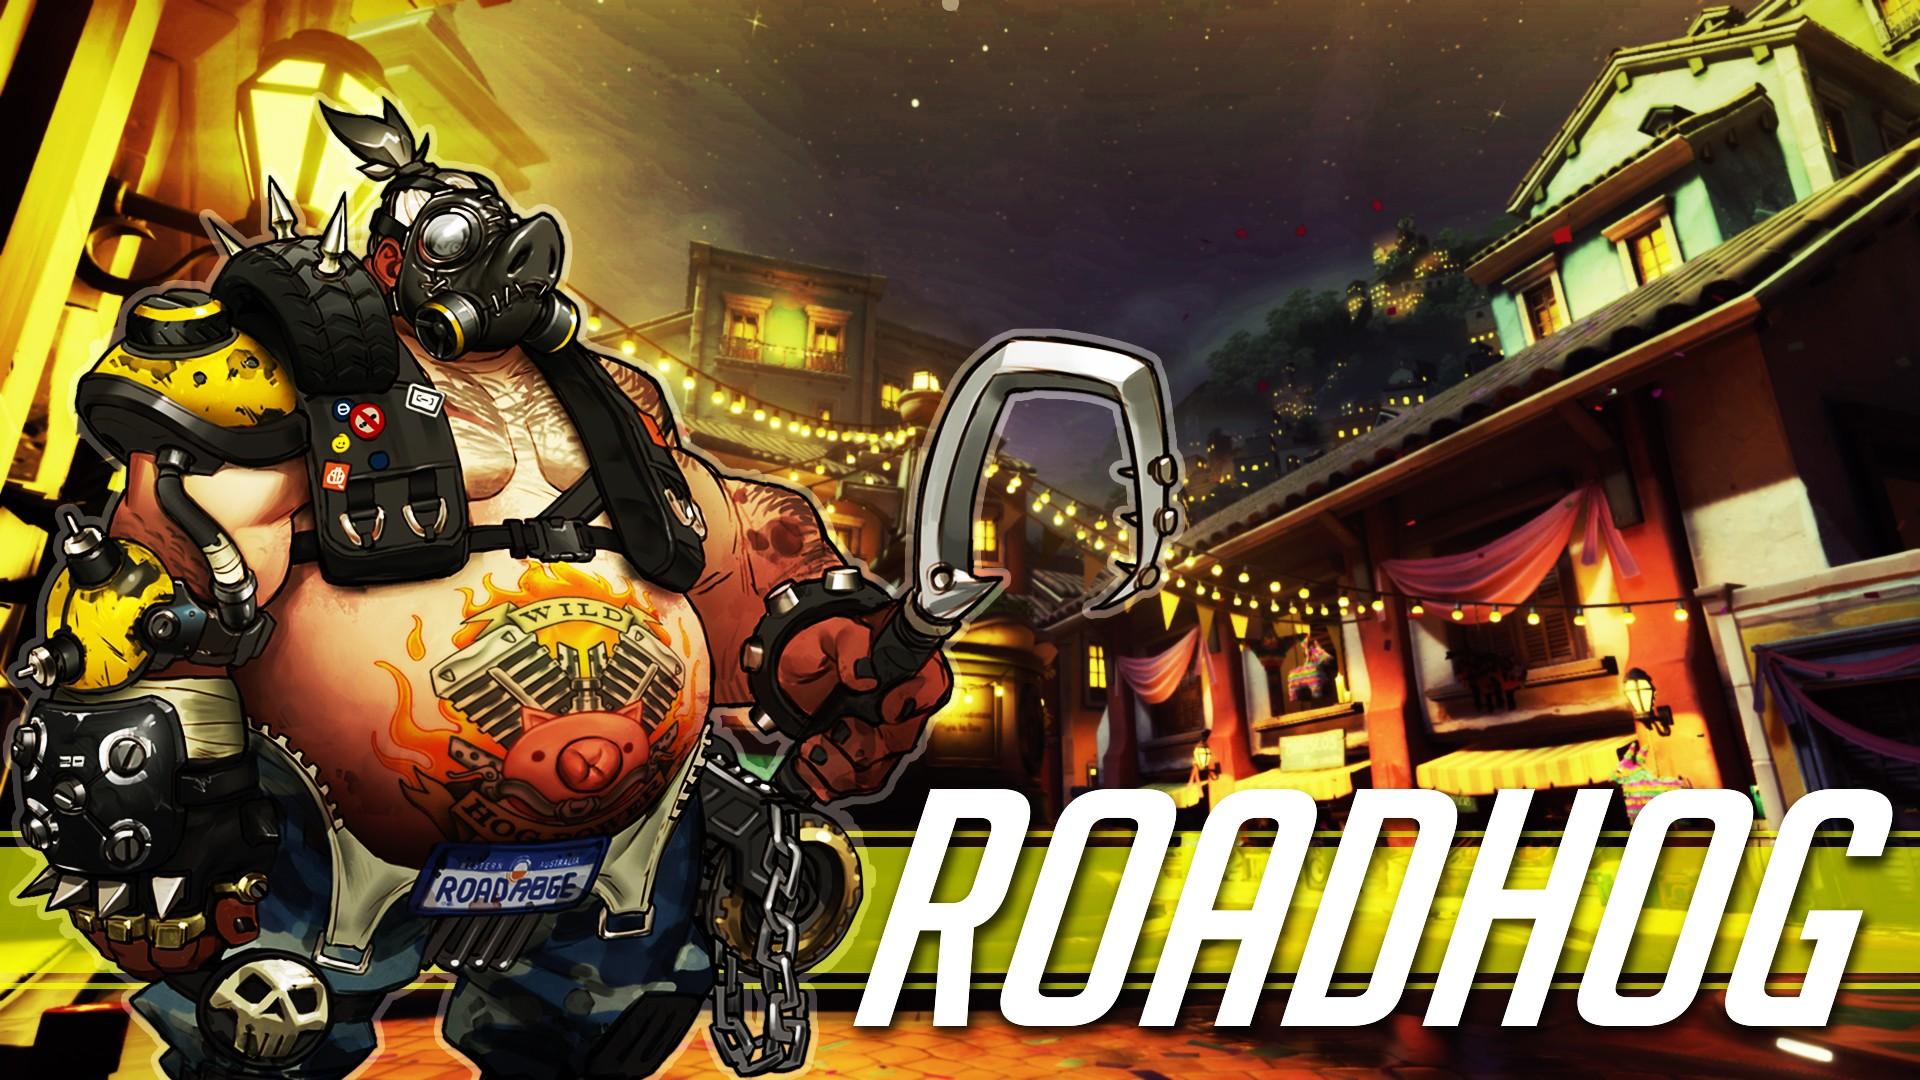 General 1920x1080 Overwatch Blizzard Entertainment video games livewirehd (Author) Roadhog Mako Rutledge